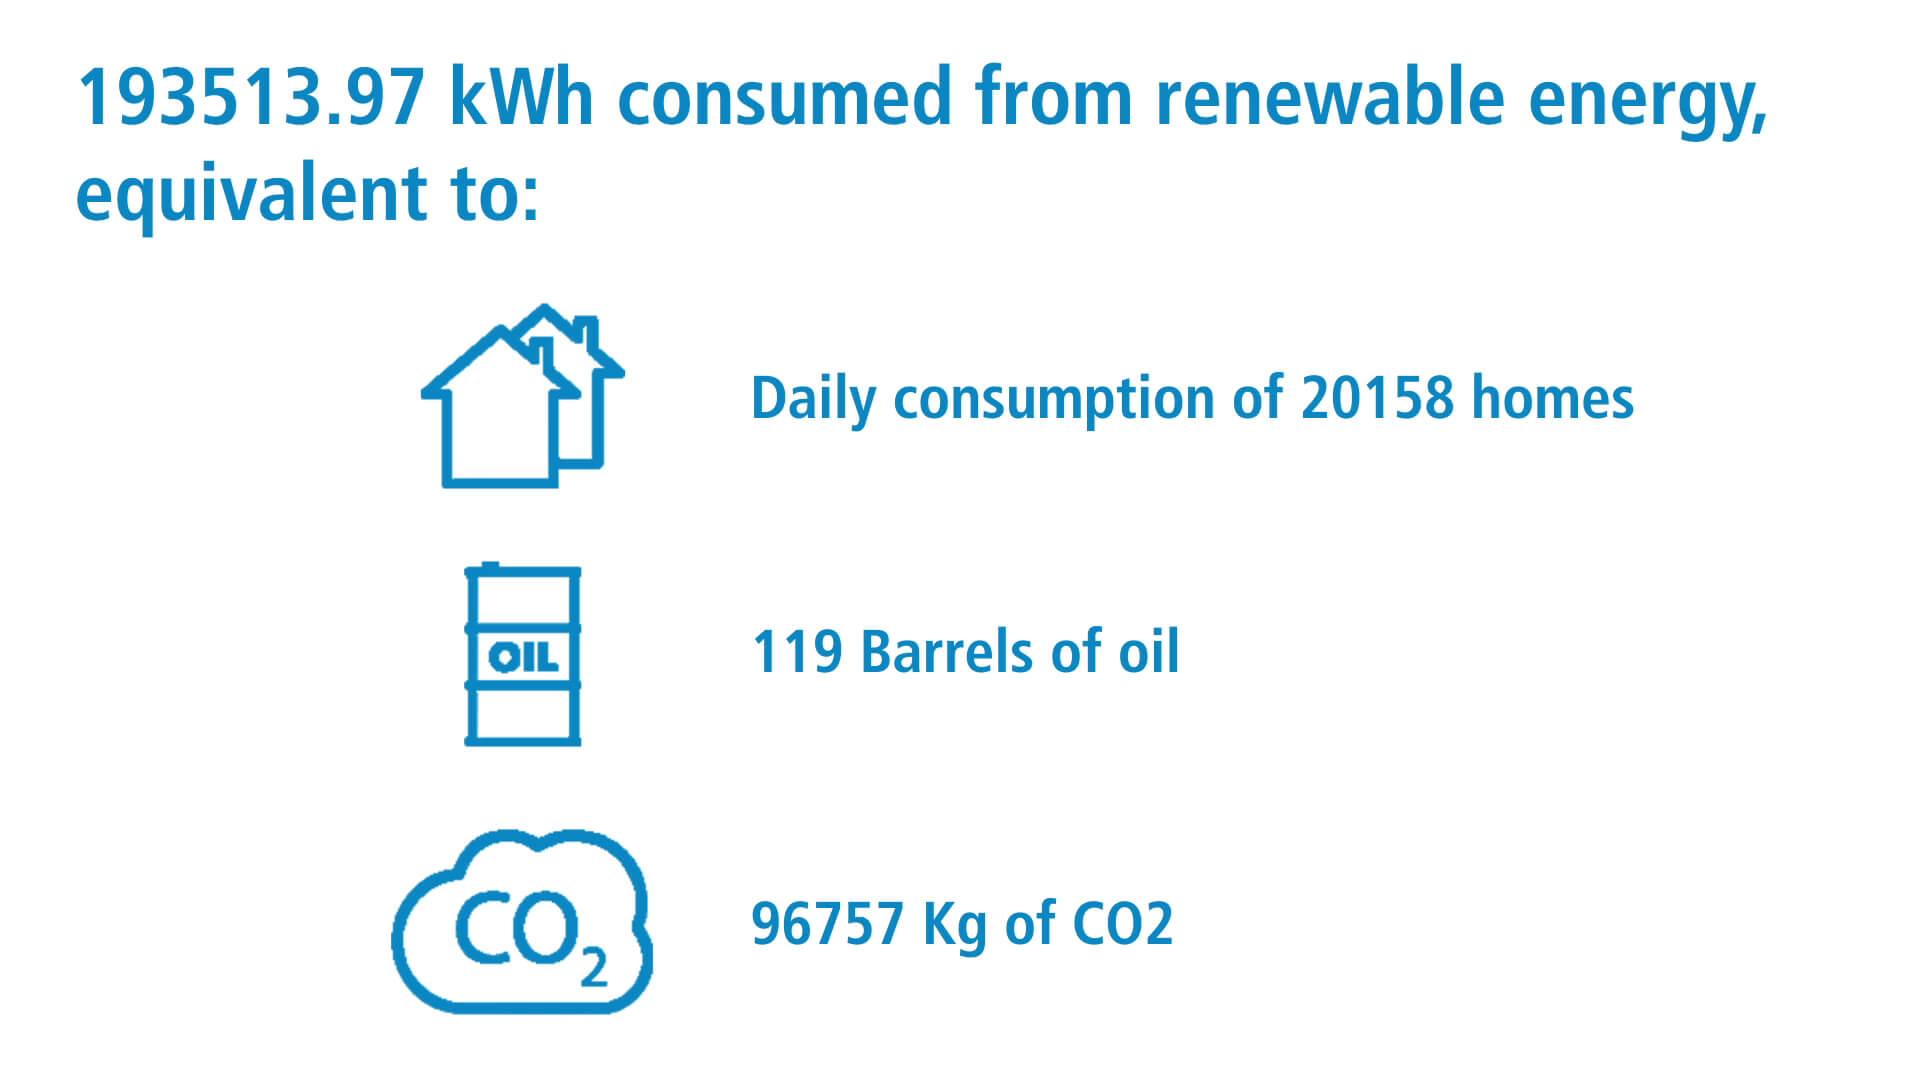 amc-renewable-energy-3.jpg